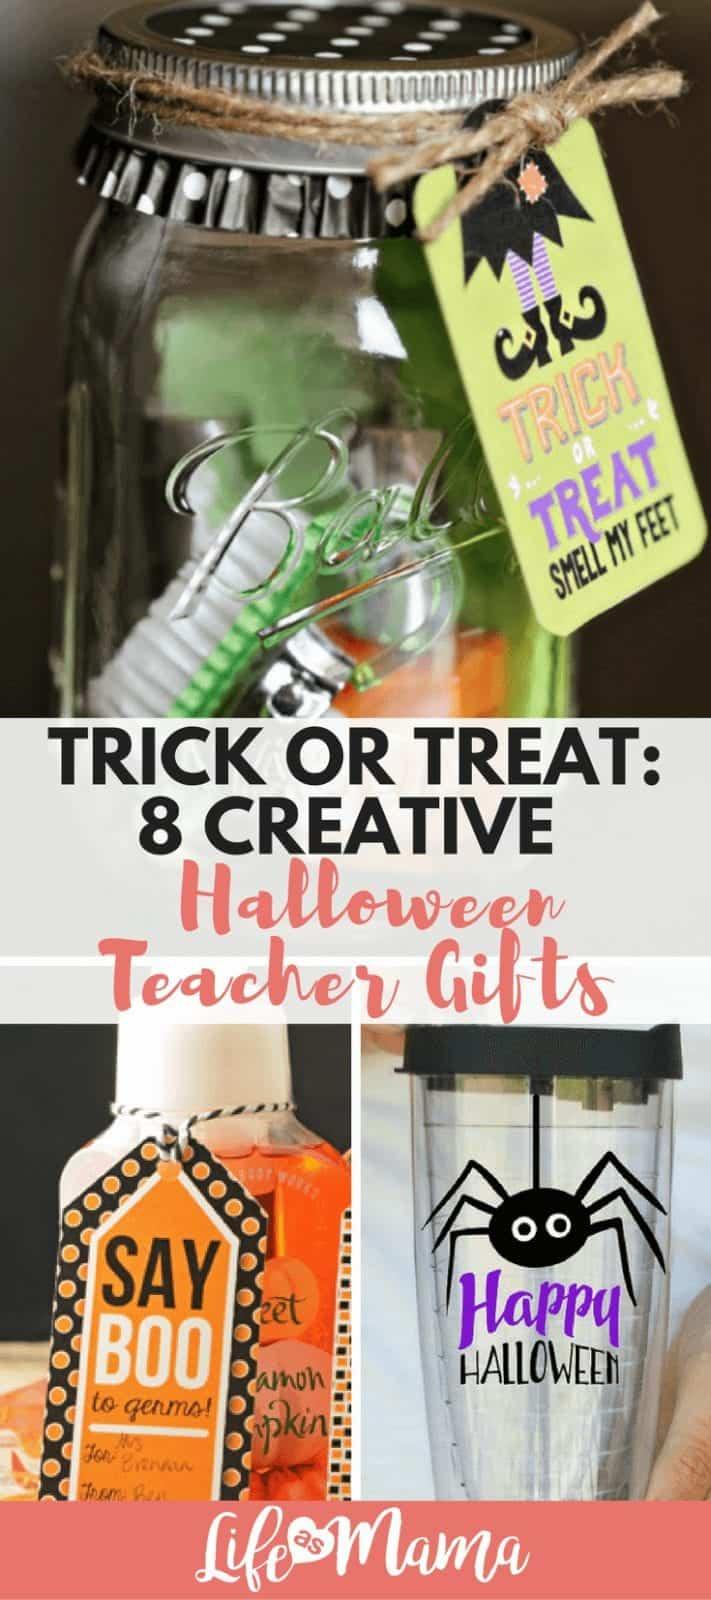 Trick-Or-Treat-8-Creative-Halloween-Teacher-Gifts